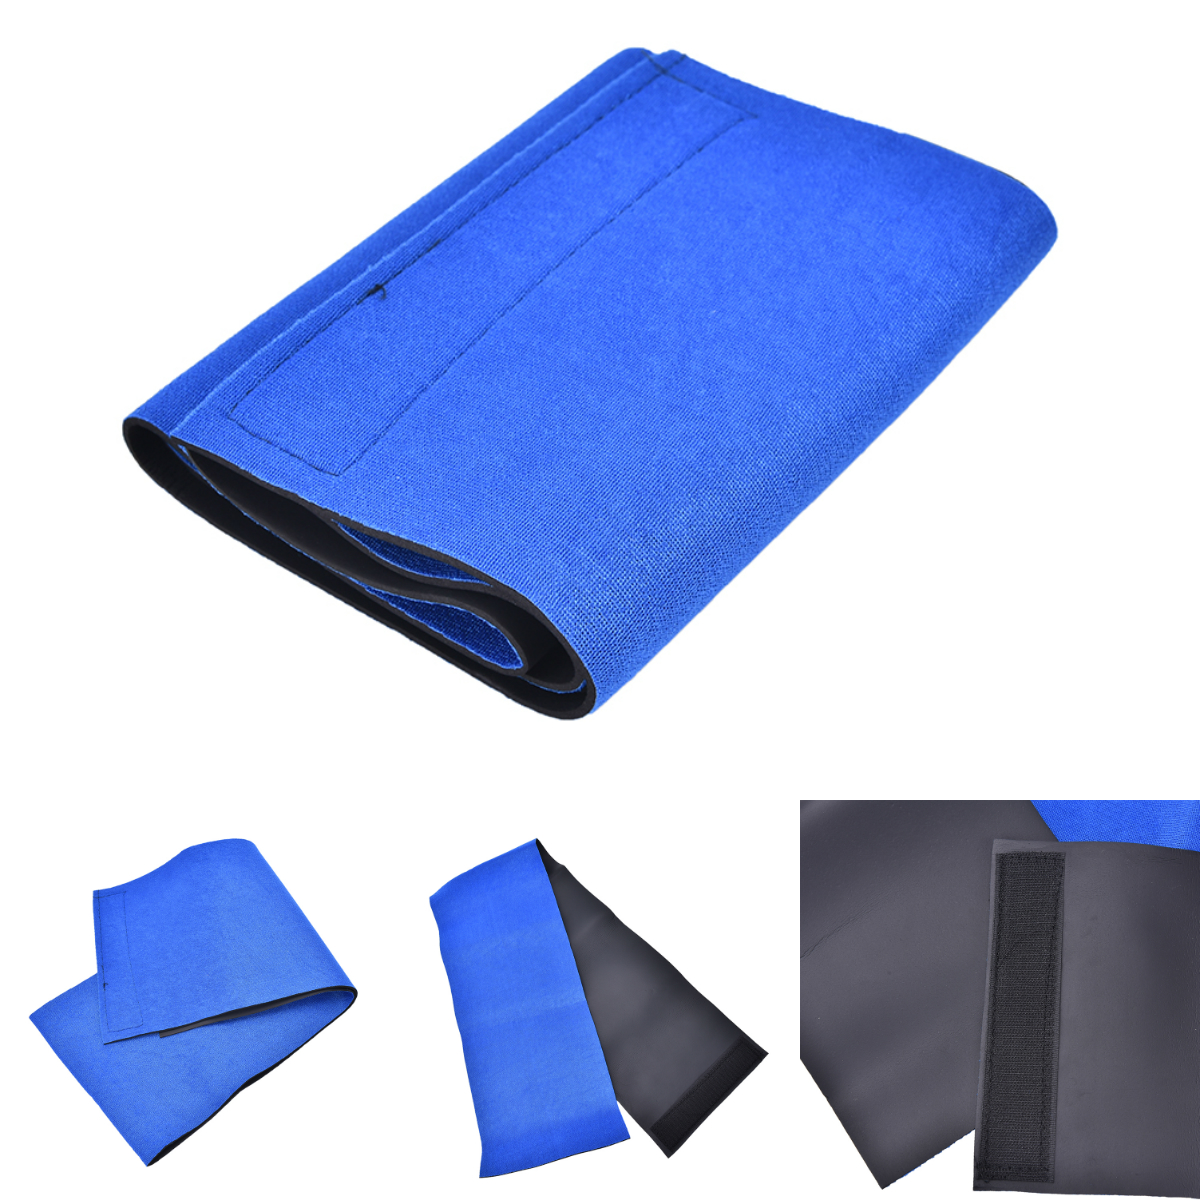 Slimming Exercise Waist Sweat Belt Wrap Fat Body Neoprene Cellulite High Quality 100 x 18.5 x 0.25 cm